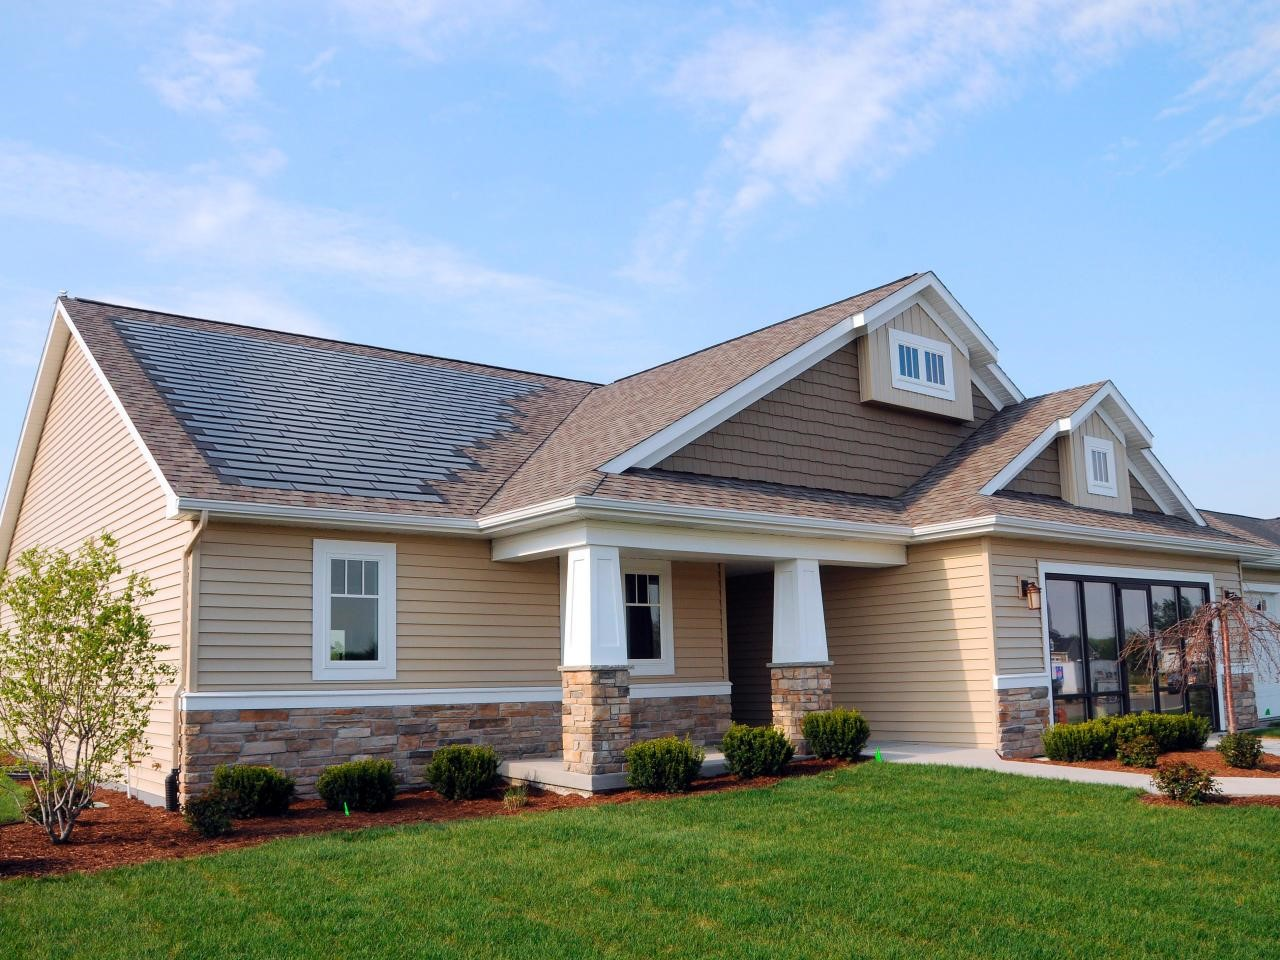 Dow 8217 S House Solar Shingles